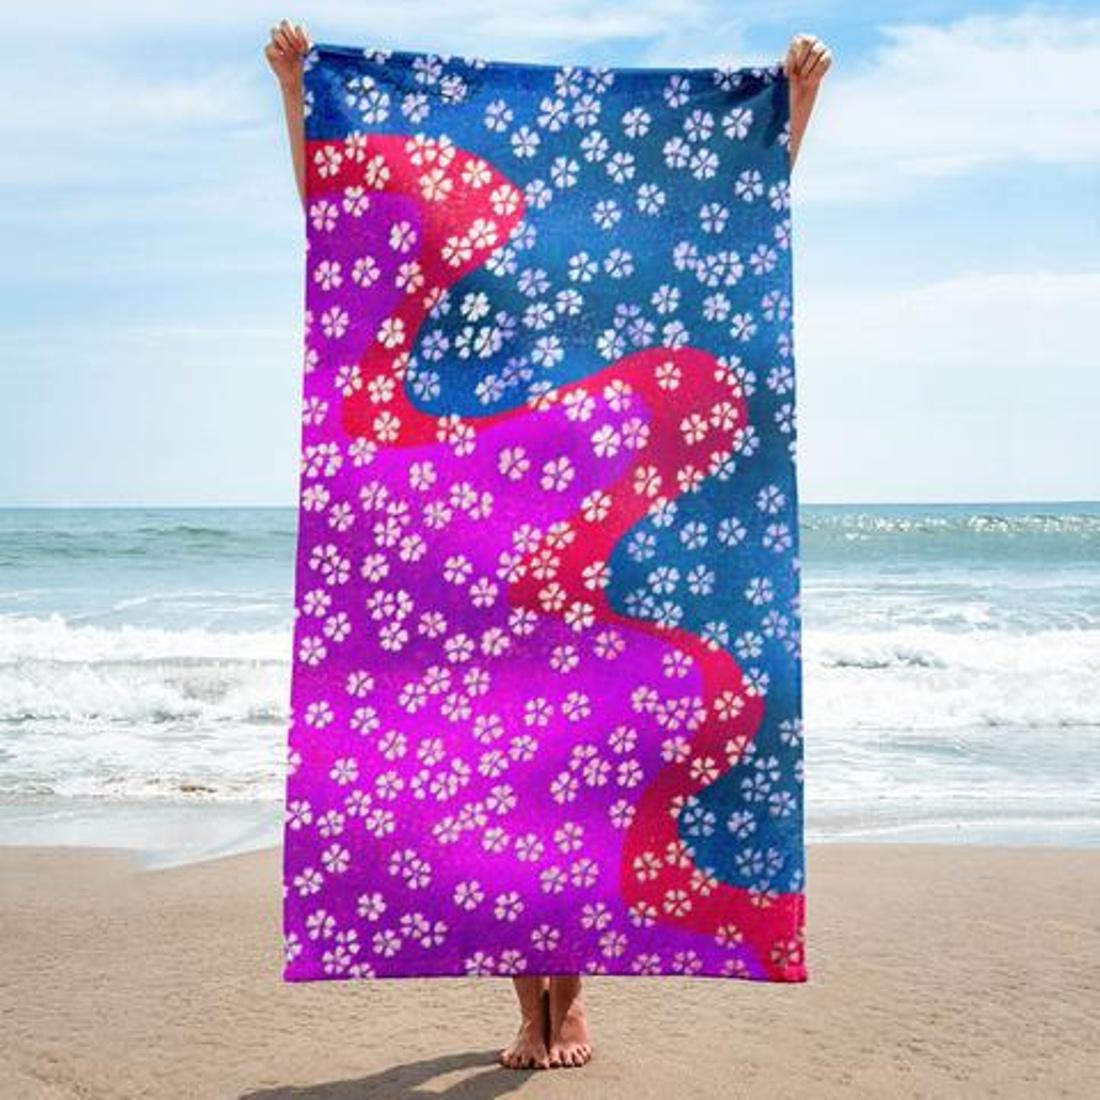 Paris METRO Coutre: Original Art Beach Towels